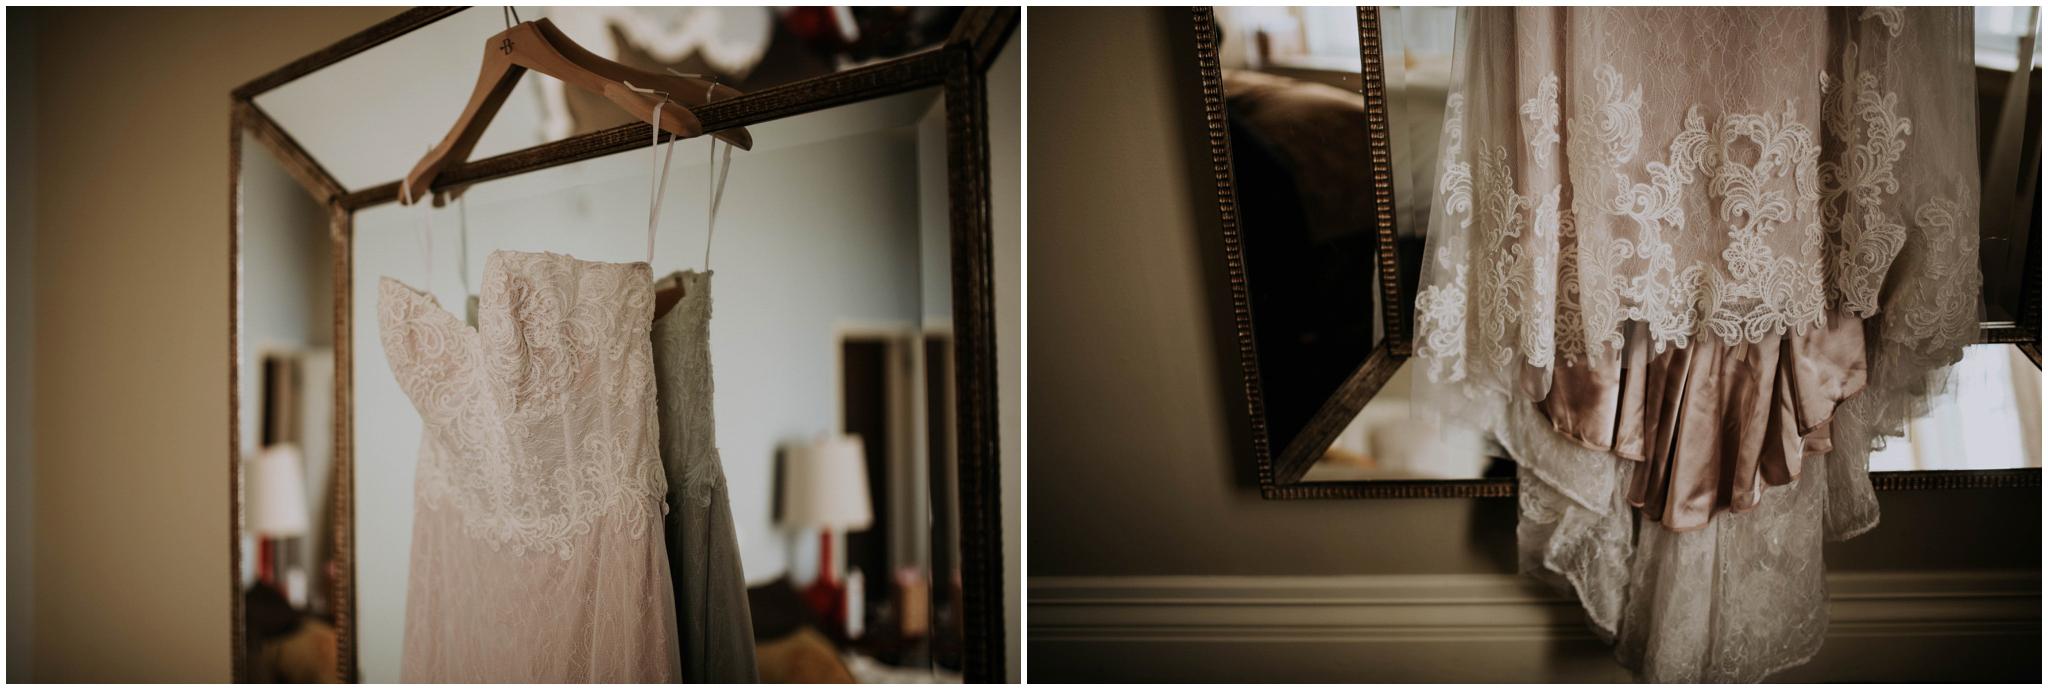 danny+mackenzie+downtown-seattle-axis-wedding-seattle-photographer-002.jpg